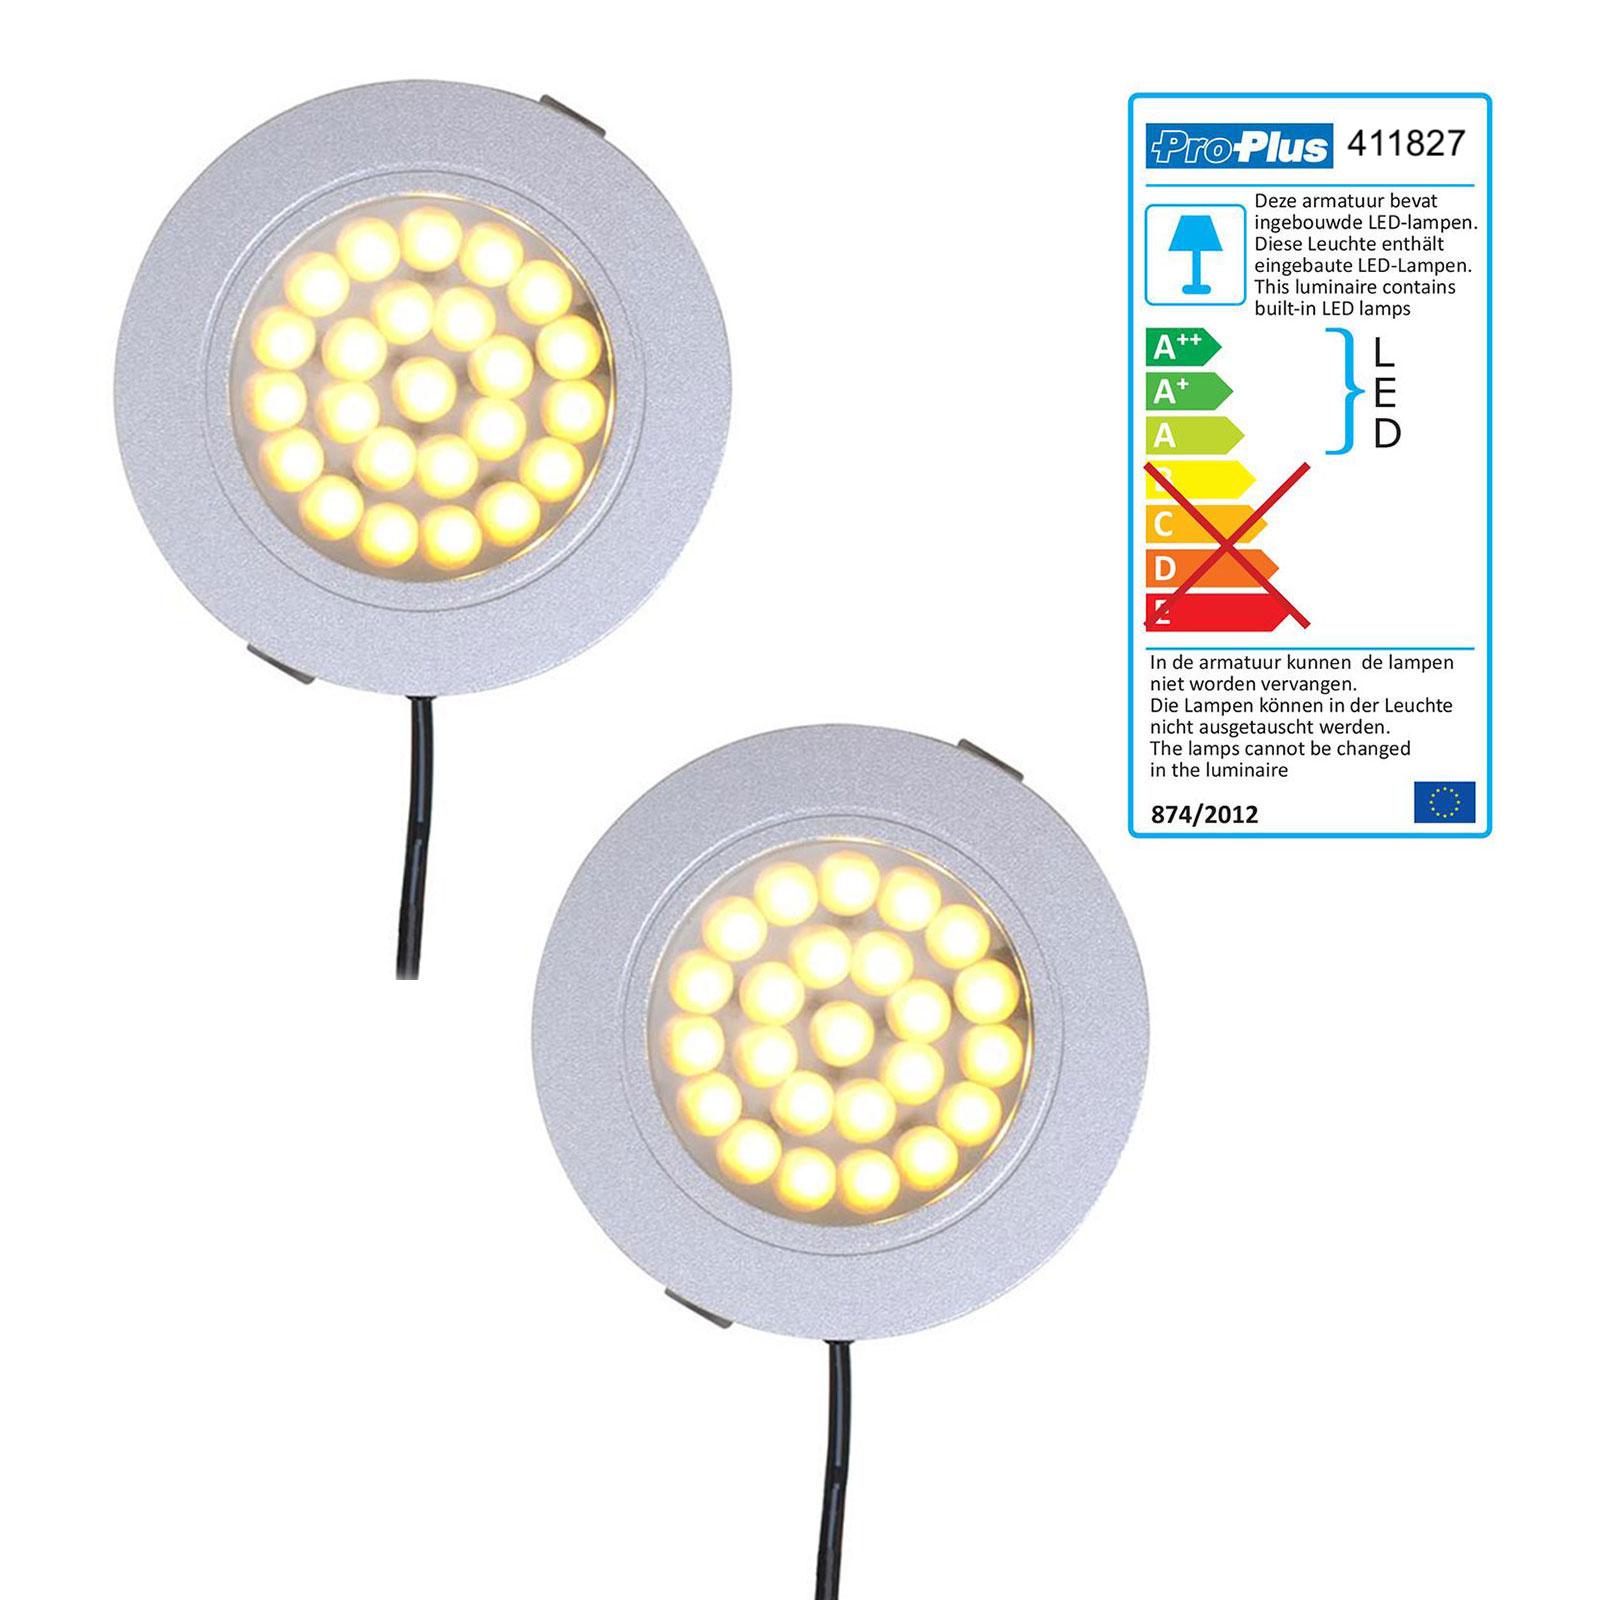 2er Set Einbauspot 24 LED-Deckenleuchte 12v, 220lm, Ø65x11mm